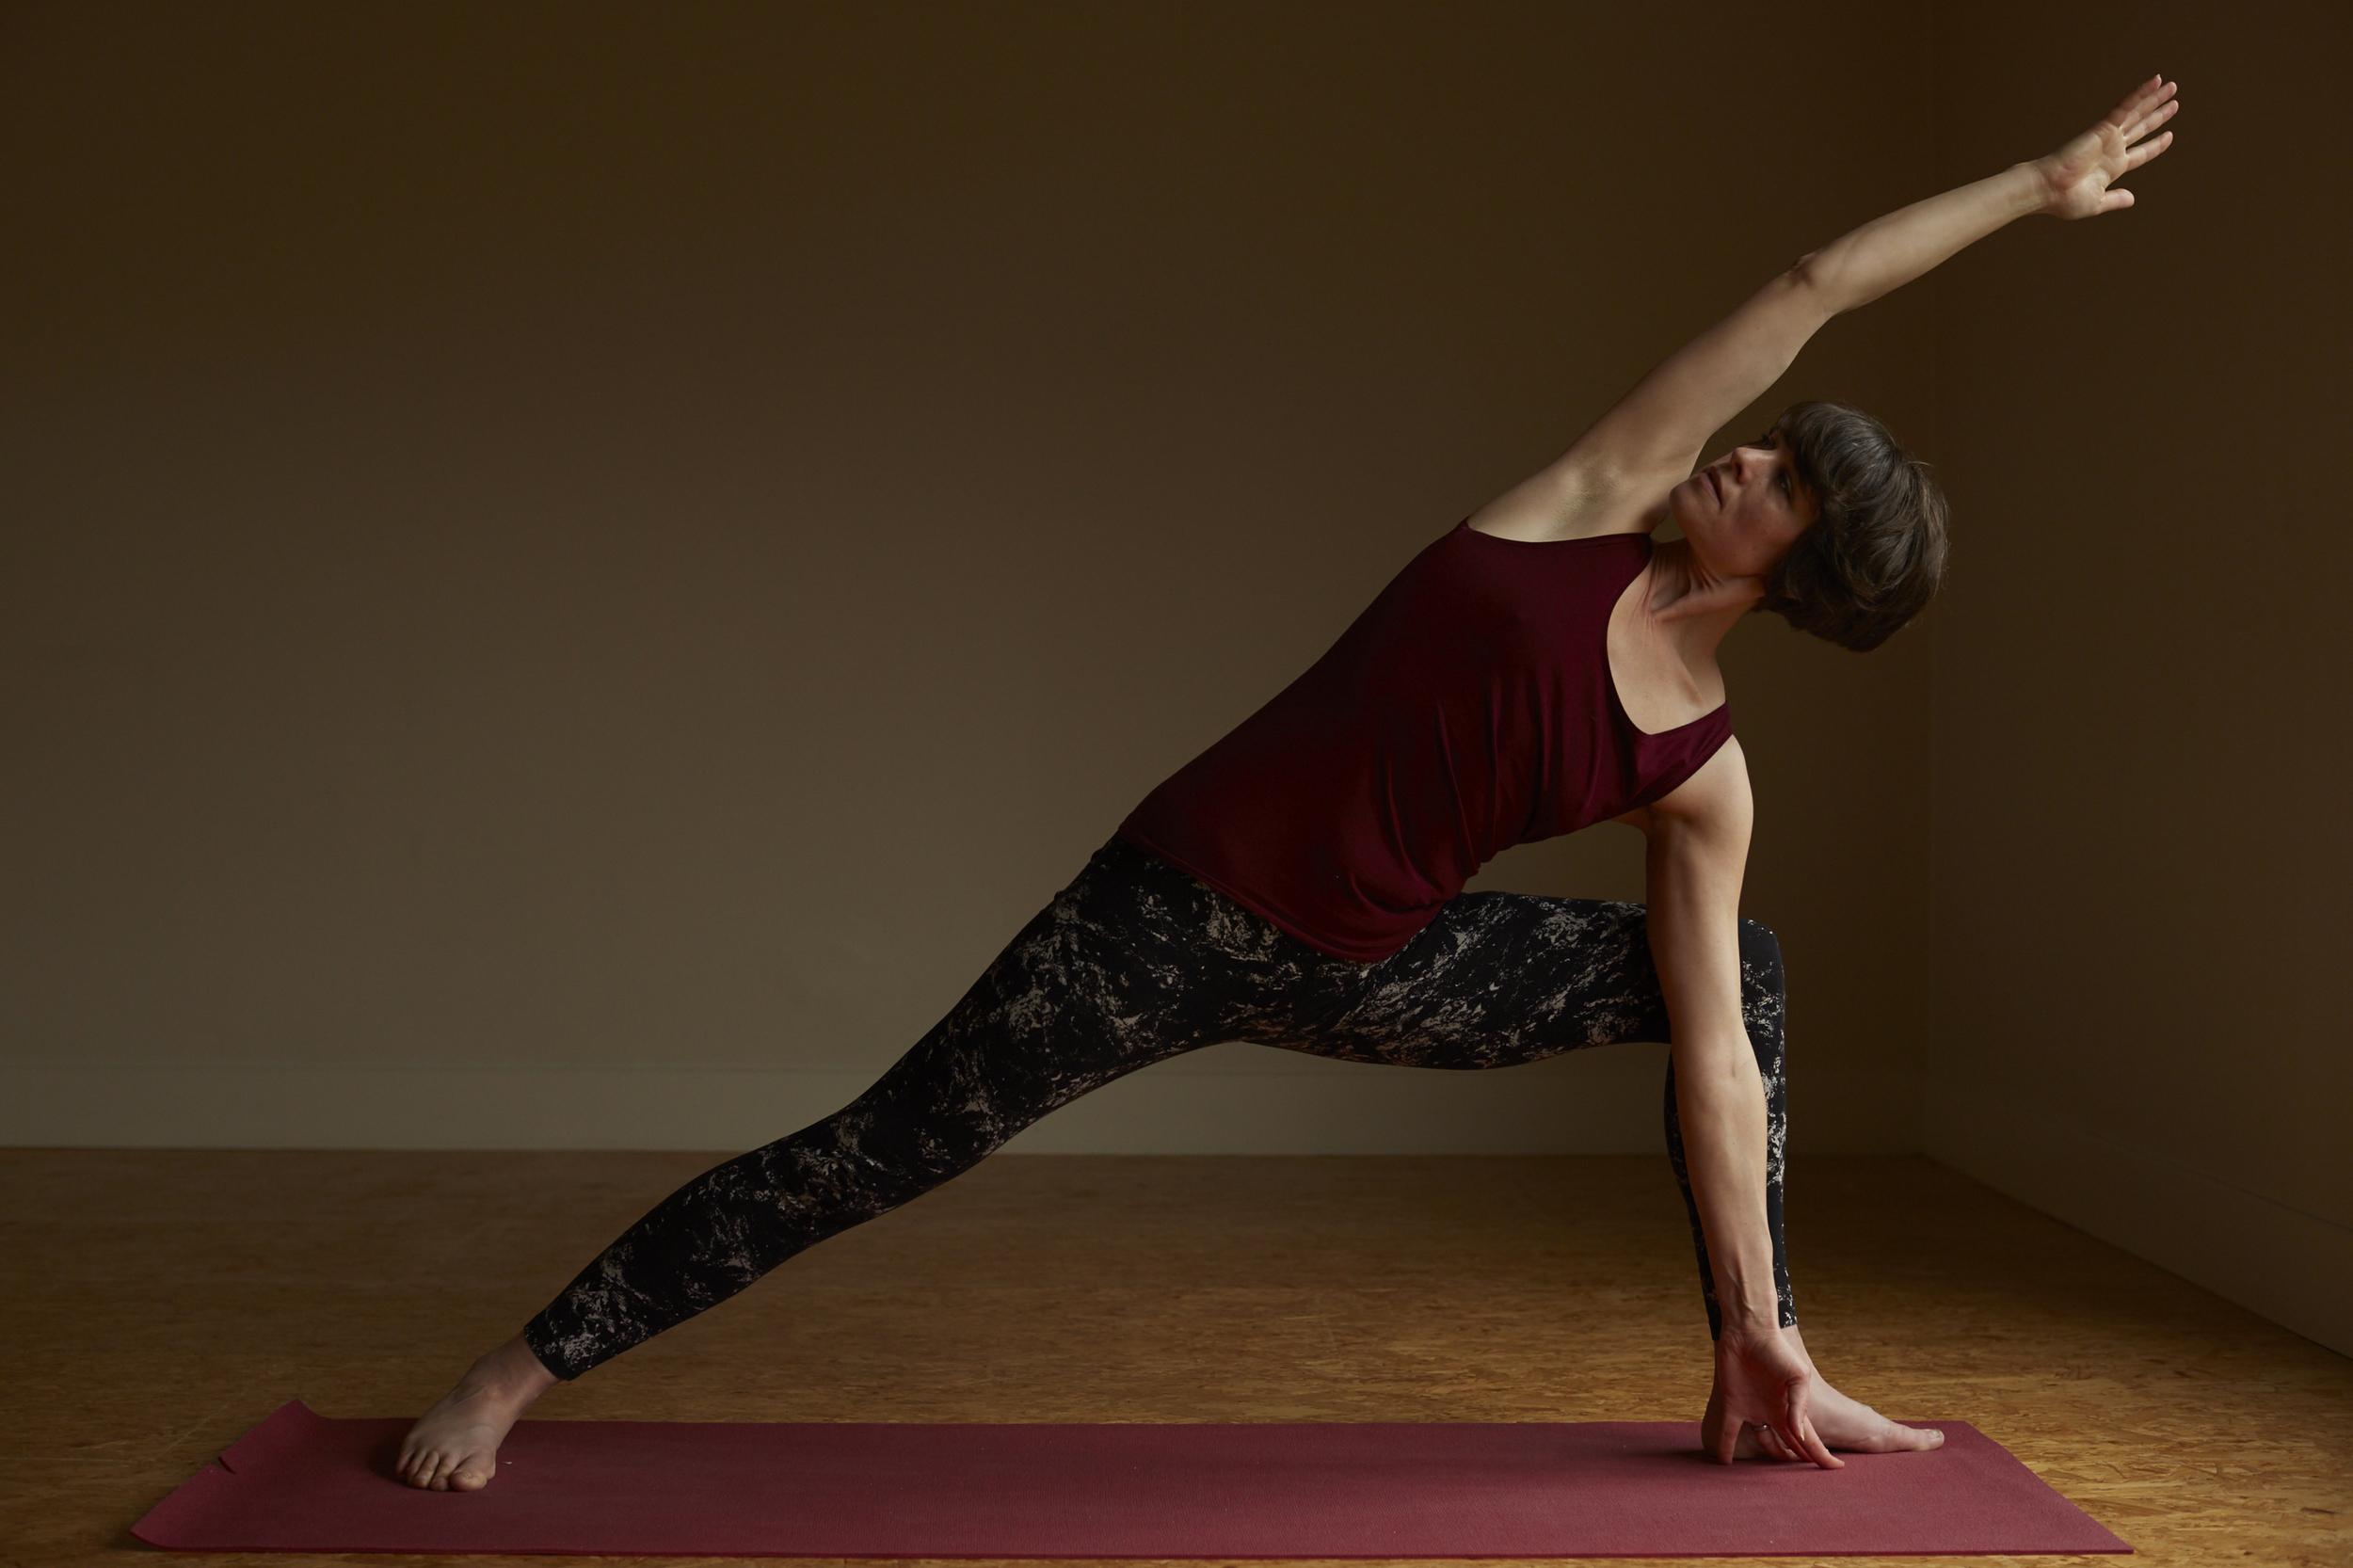 Jess_Yoga14877.jpg